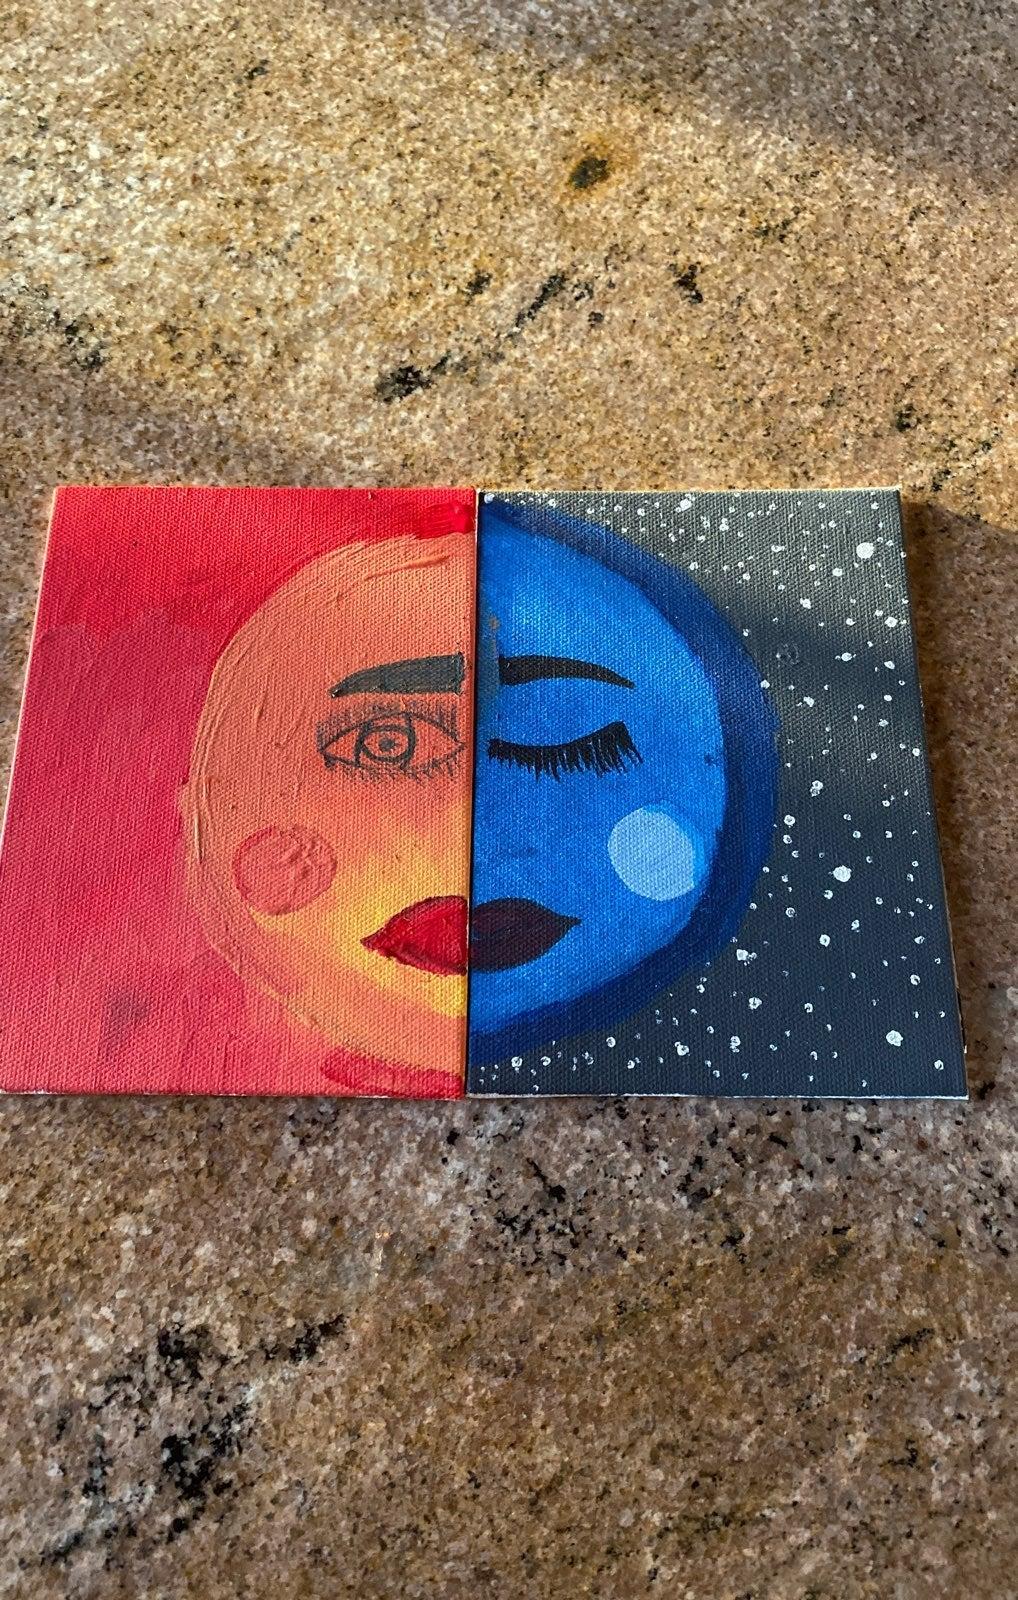 paintings and artwork half sun half moon